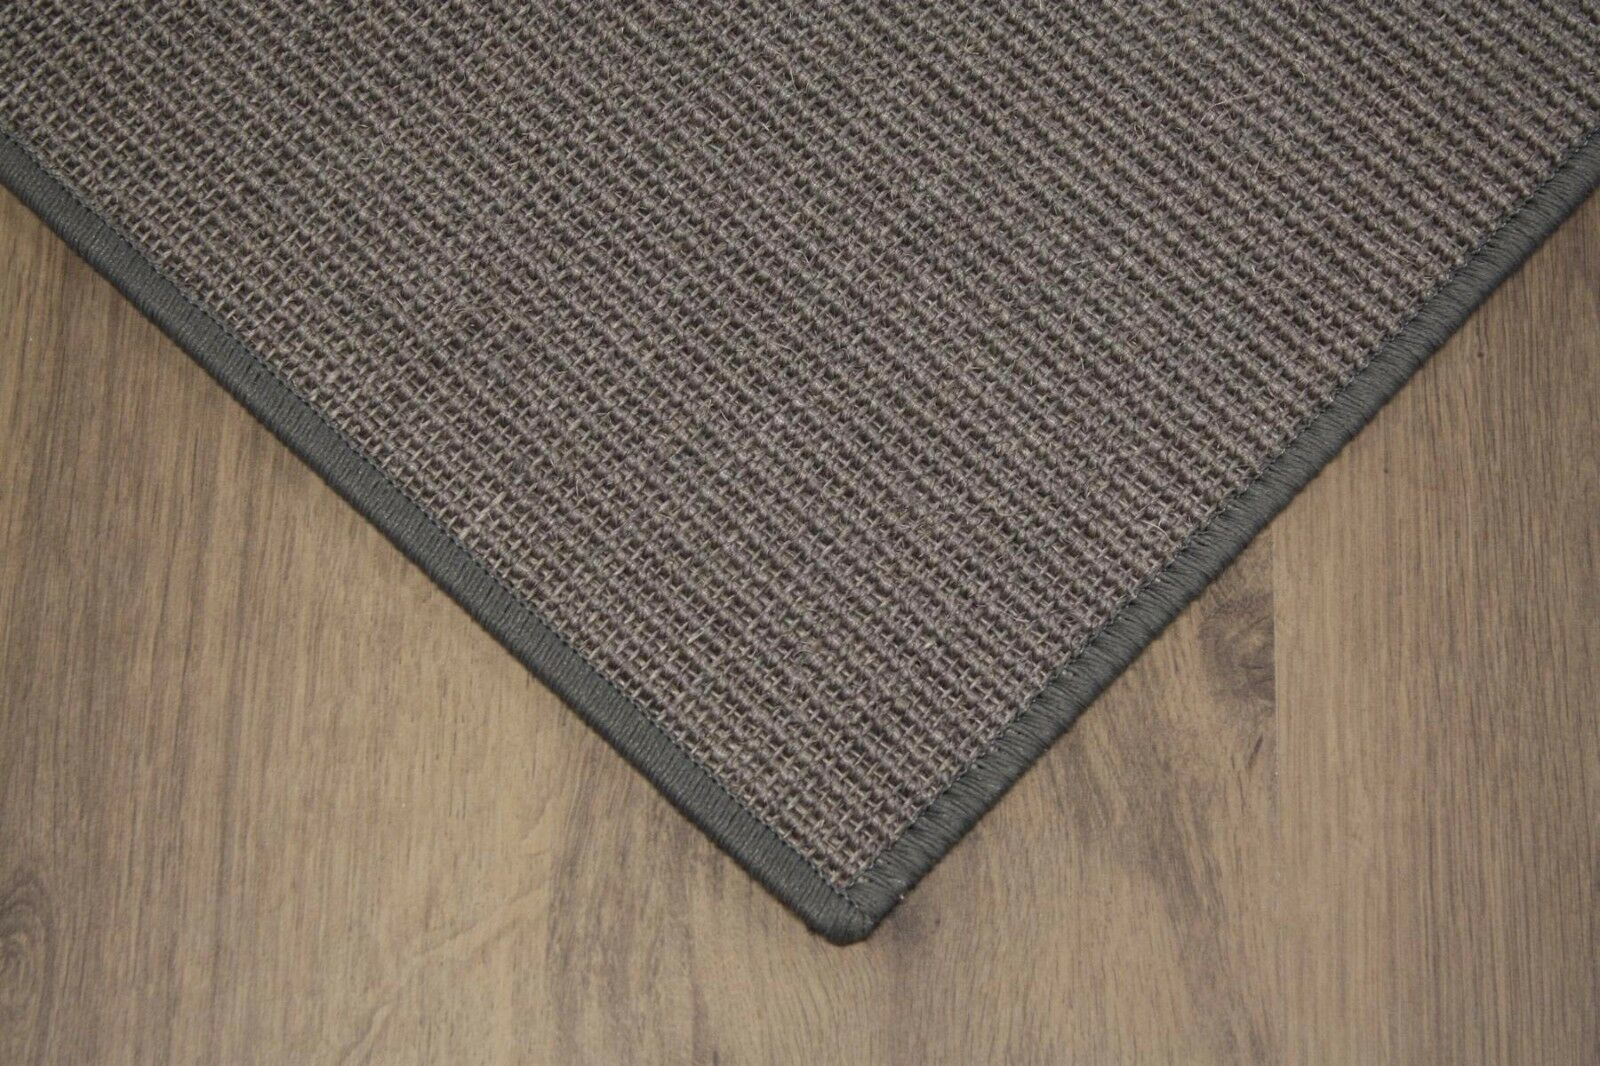 Sisal alfombra umkettelt gris 400x400cm 100% sisal gekettelt transportista